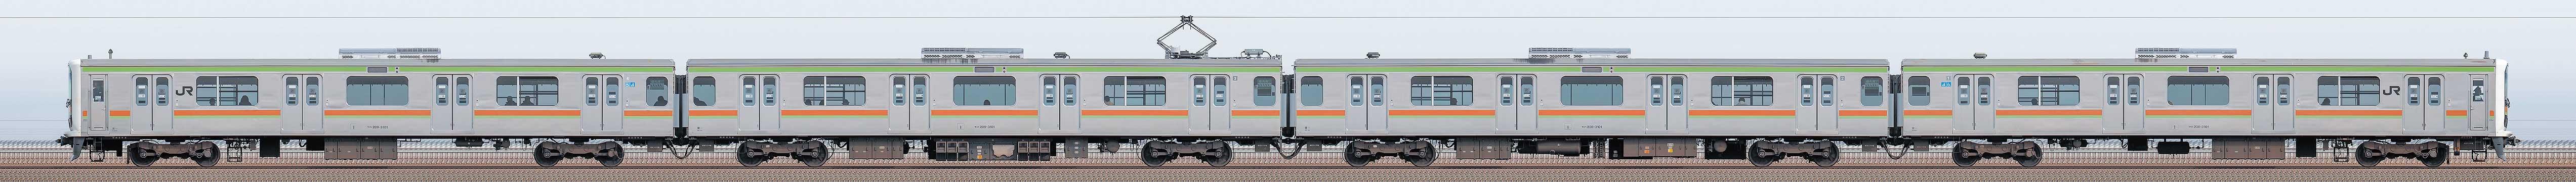 JR東日本 八高・川越線 209系3100番台 川71編成(山側)の編成サイドビュー